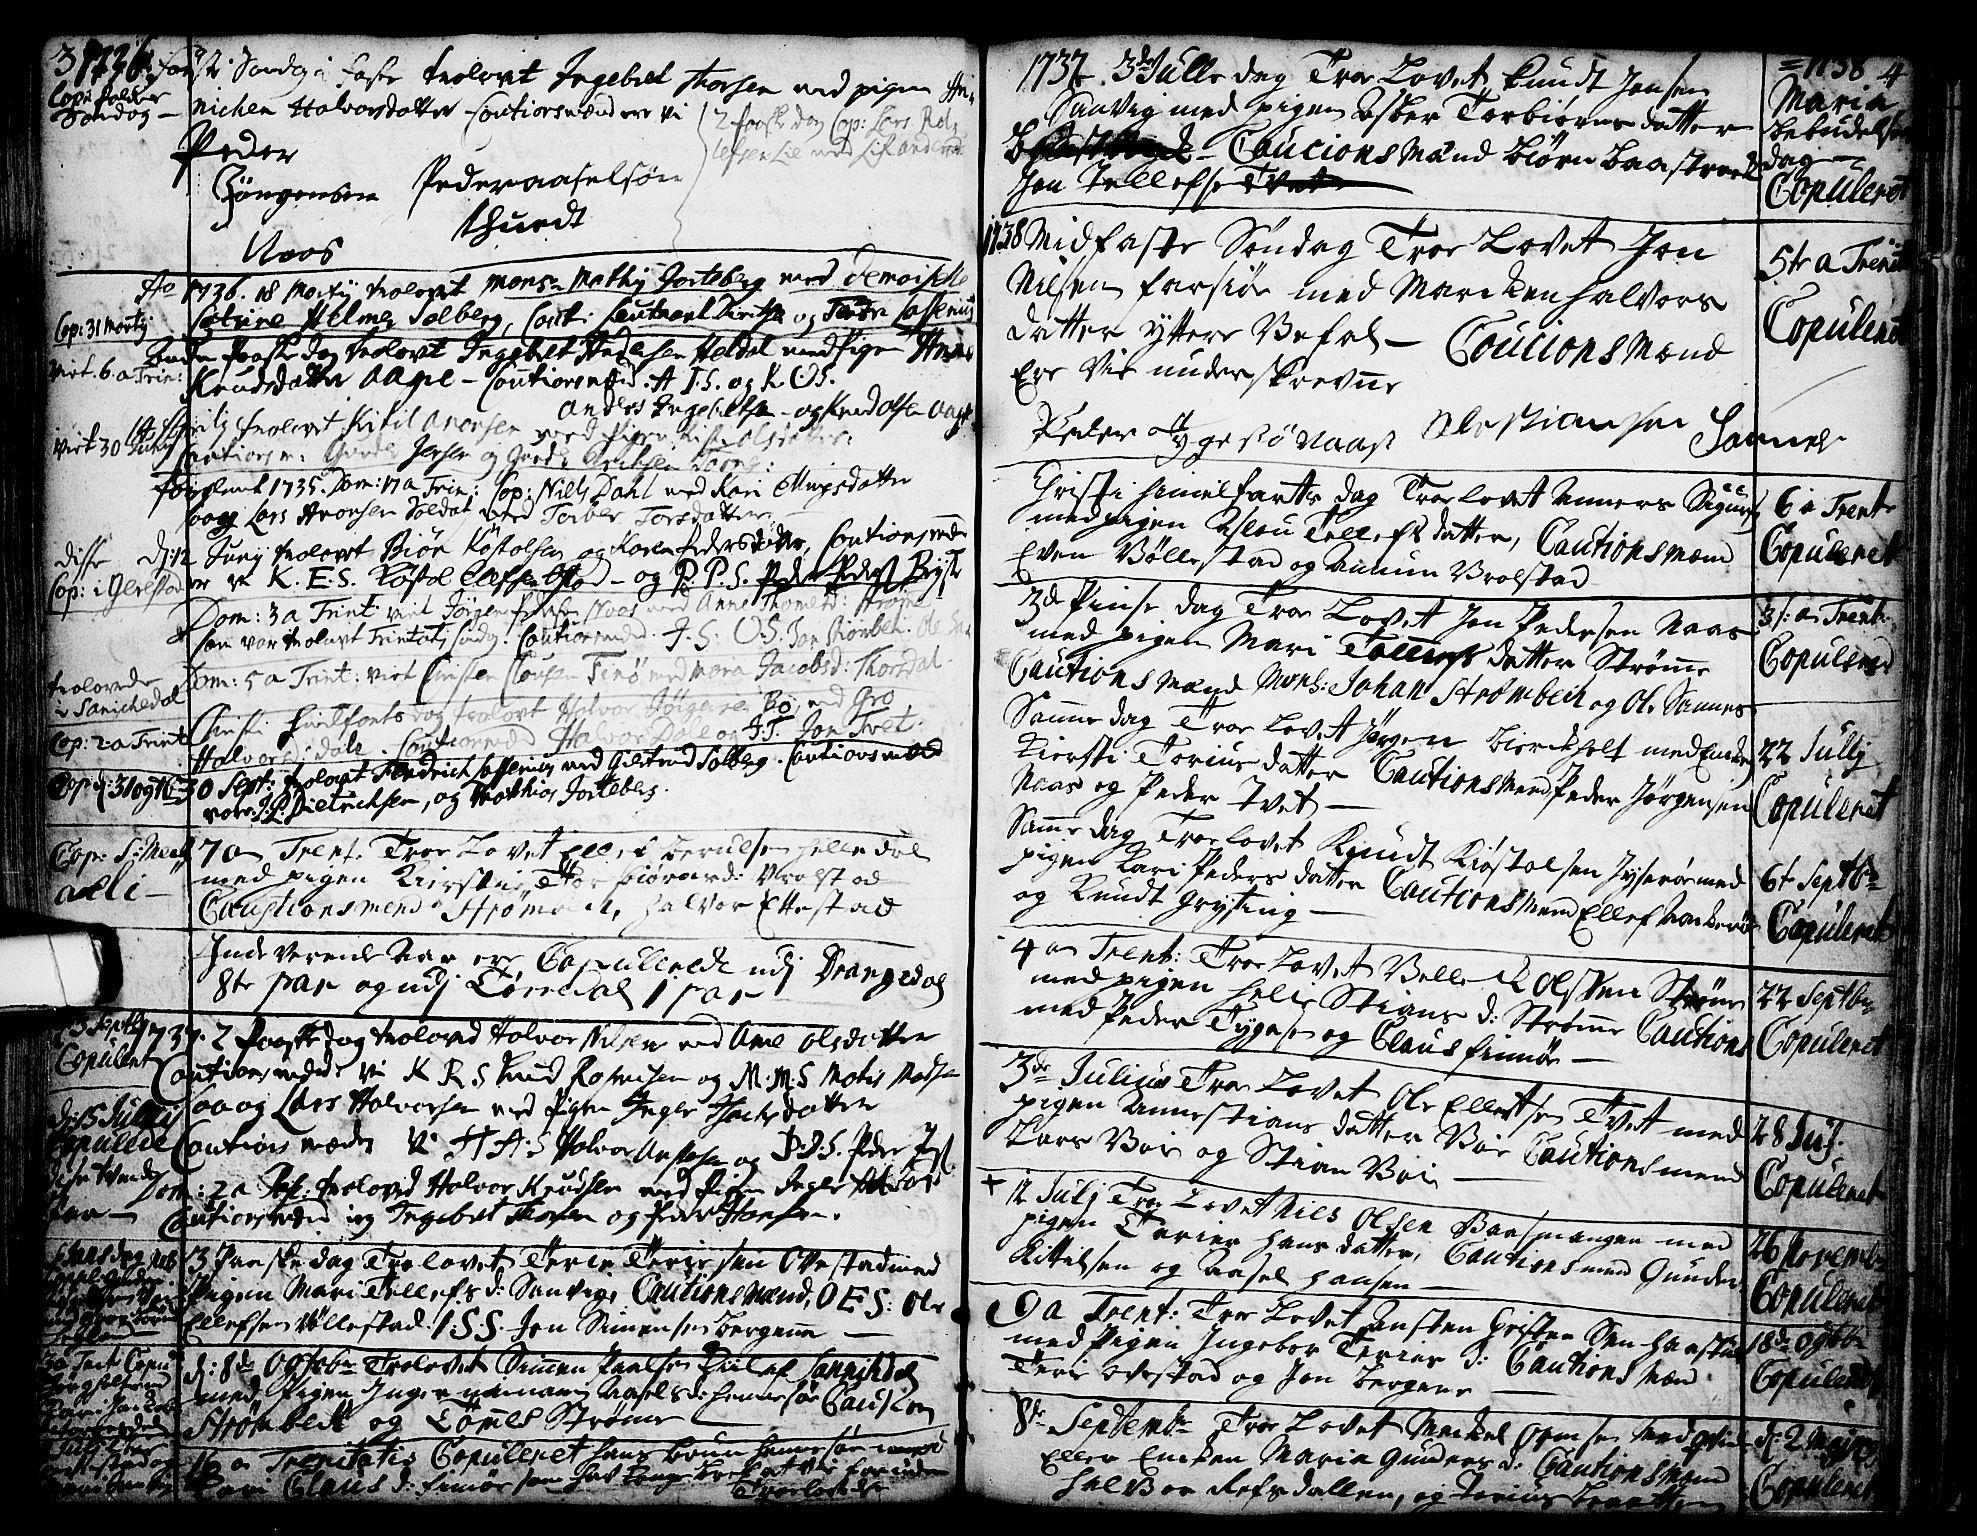 SAKO, Drangedal kirkebøker, F/Fa/L0002: Ministerialbok nr. 2, 1733-1753, s. 3-4